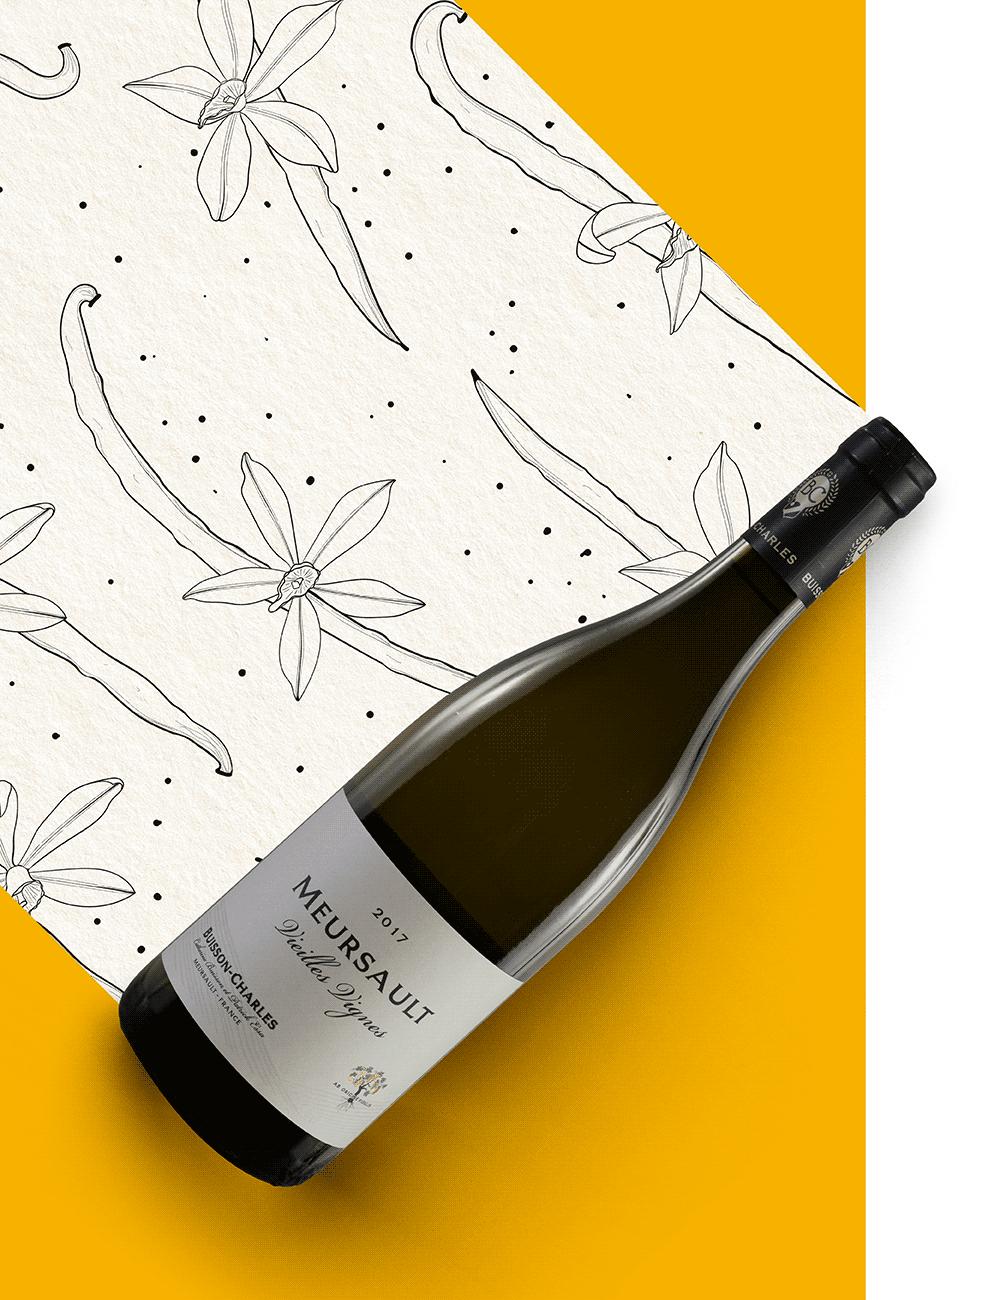 Buisson-Charles Meursault Vieilles Vignes 2017